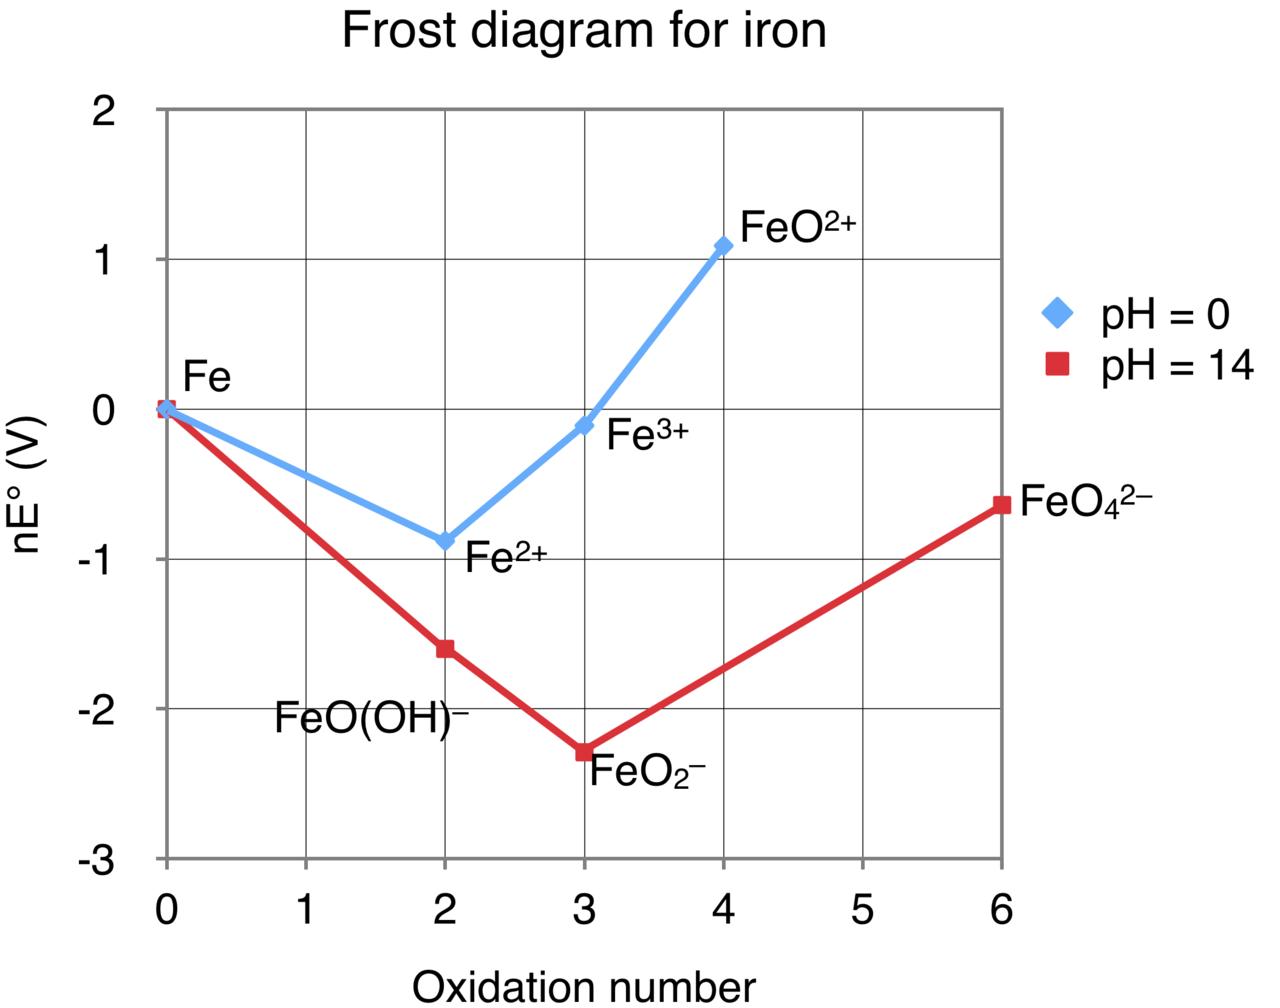 frost diagram iron schematics wiring diagrams u2022 rh seniorlivinguniversity co MO Electron Diagram MO Energy Diagram